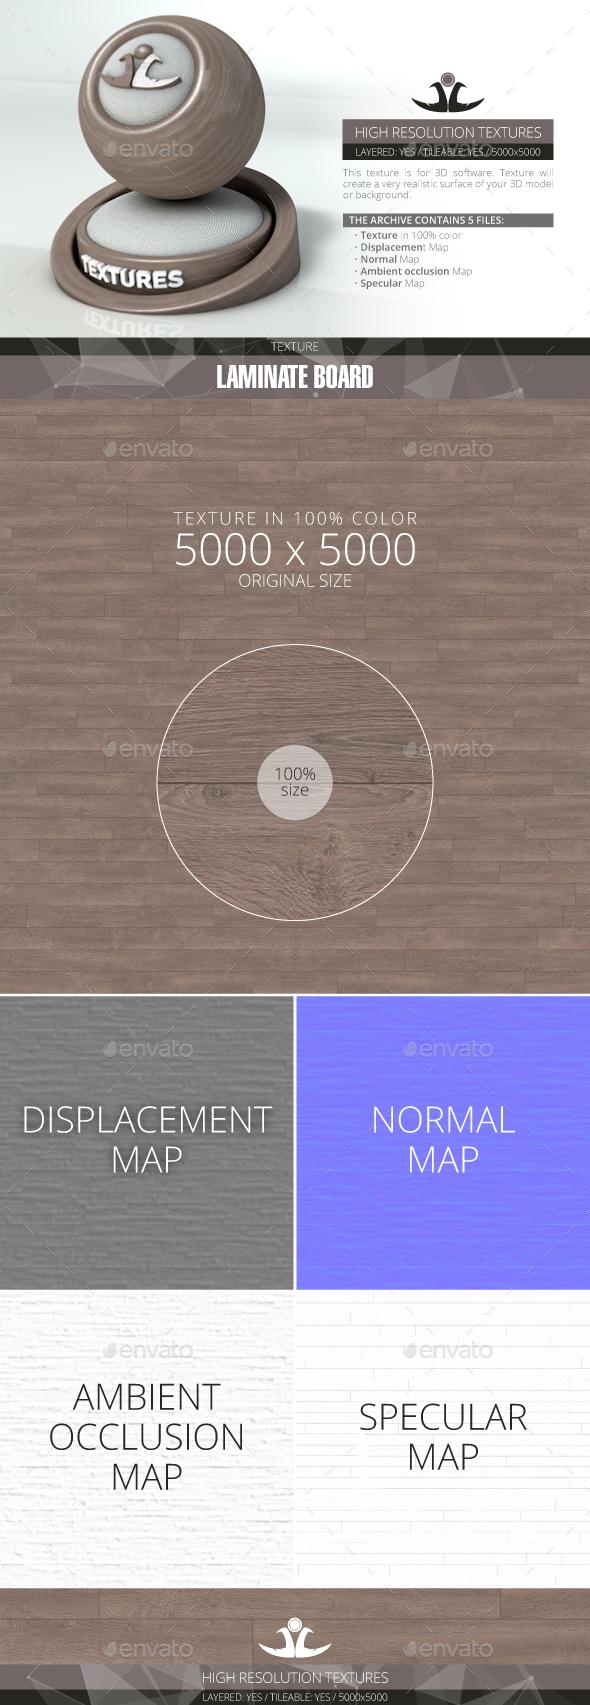 Laminate Board 38 - 3DOcean Item for Sale